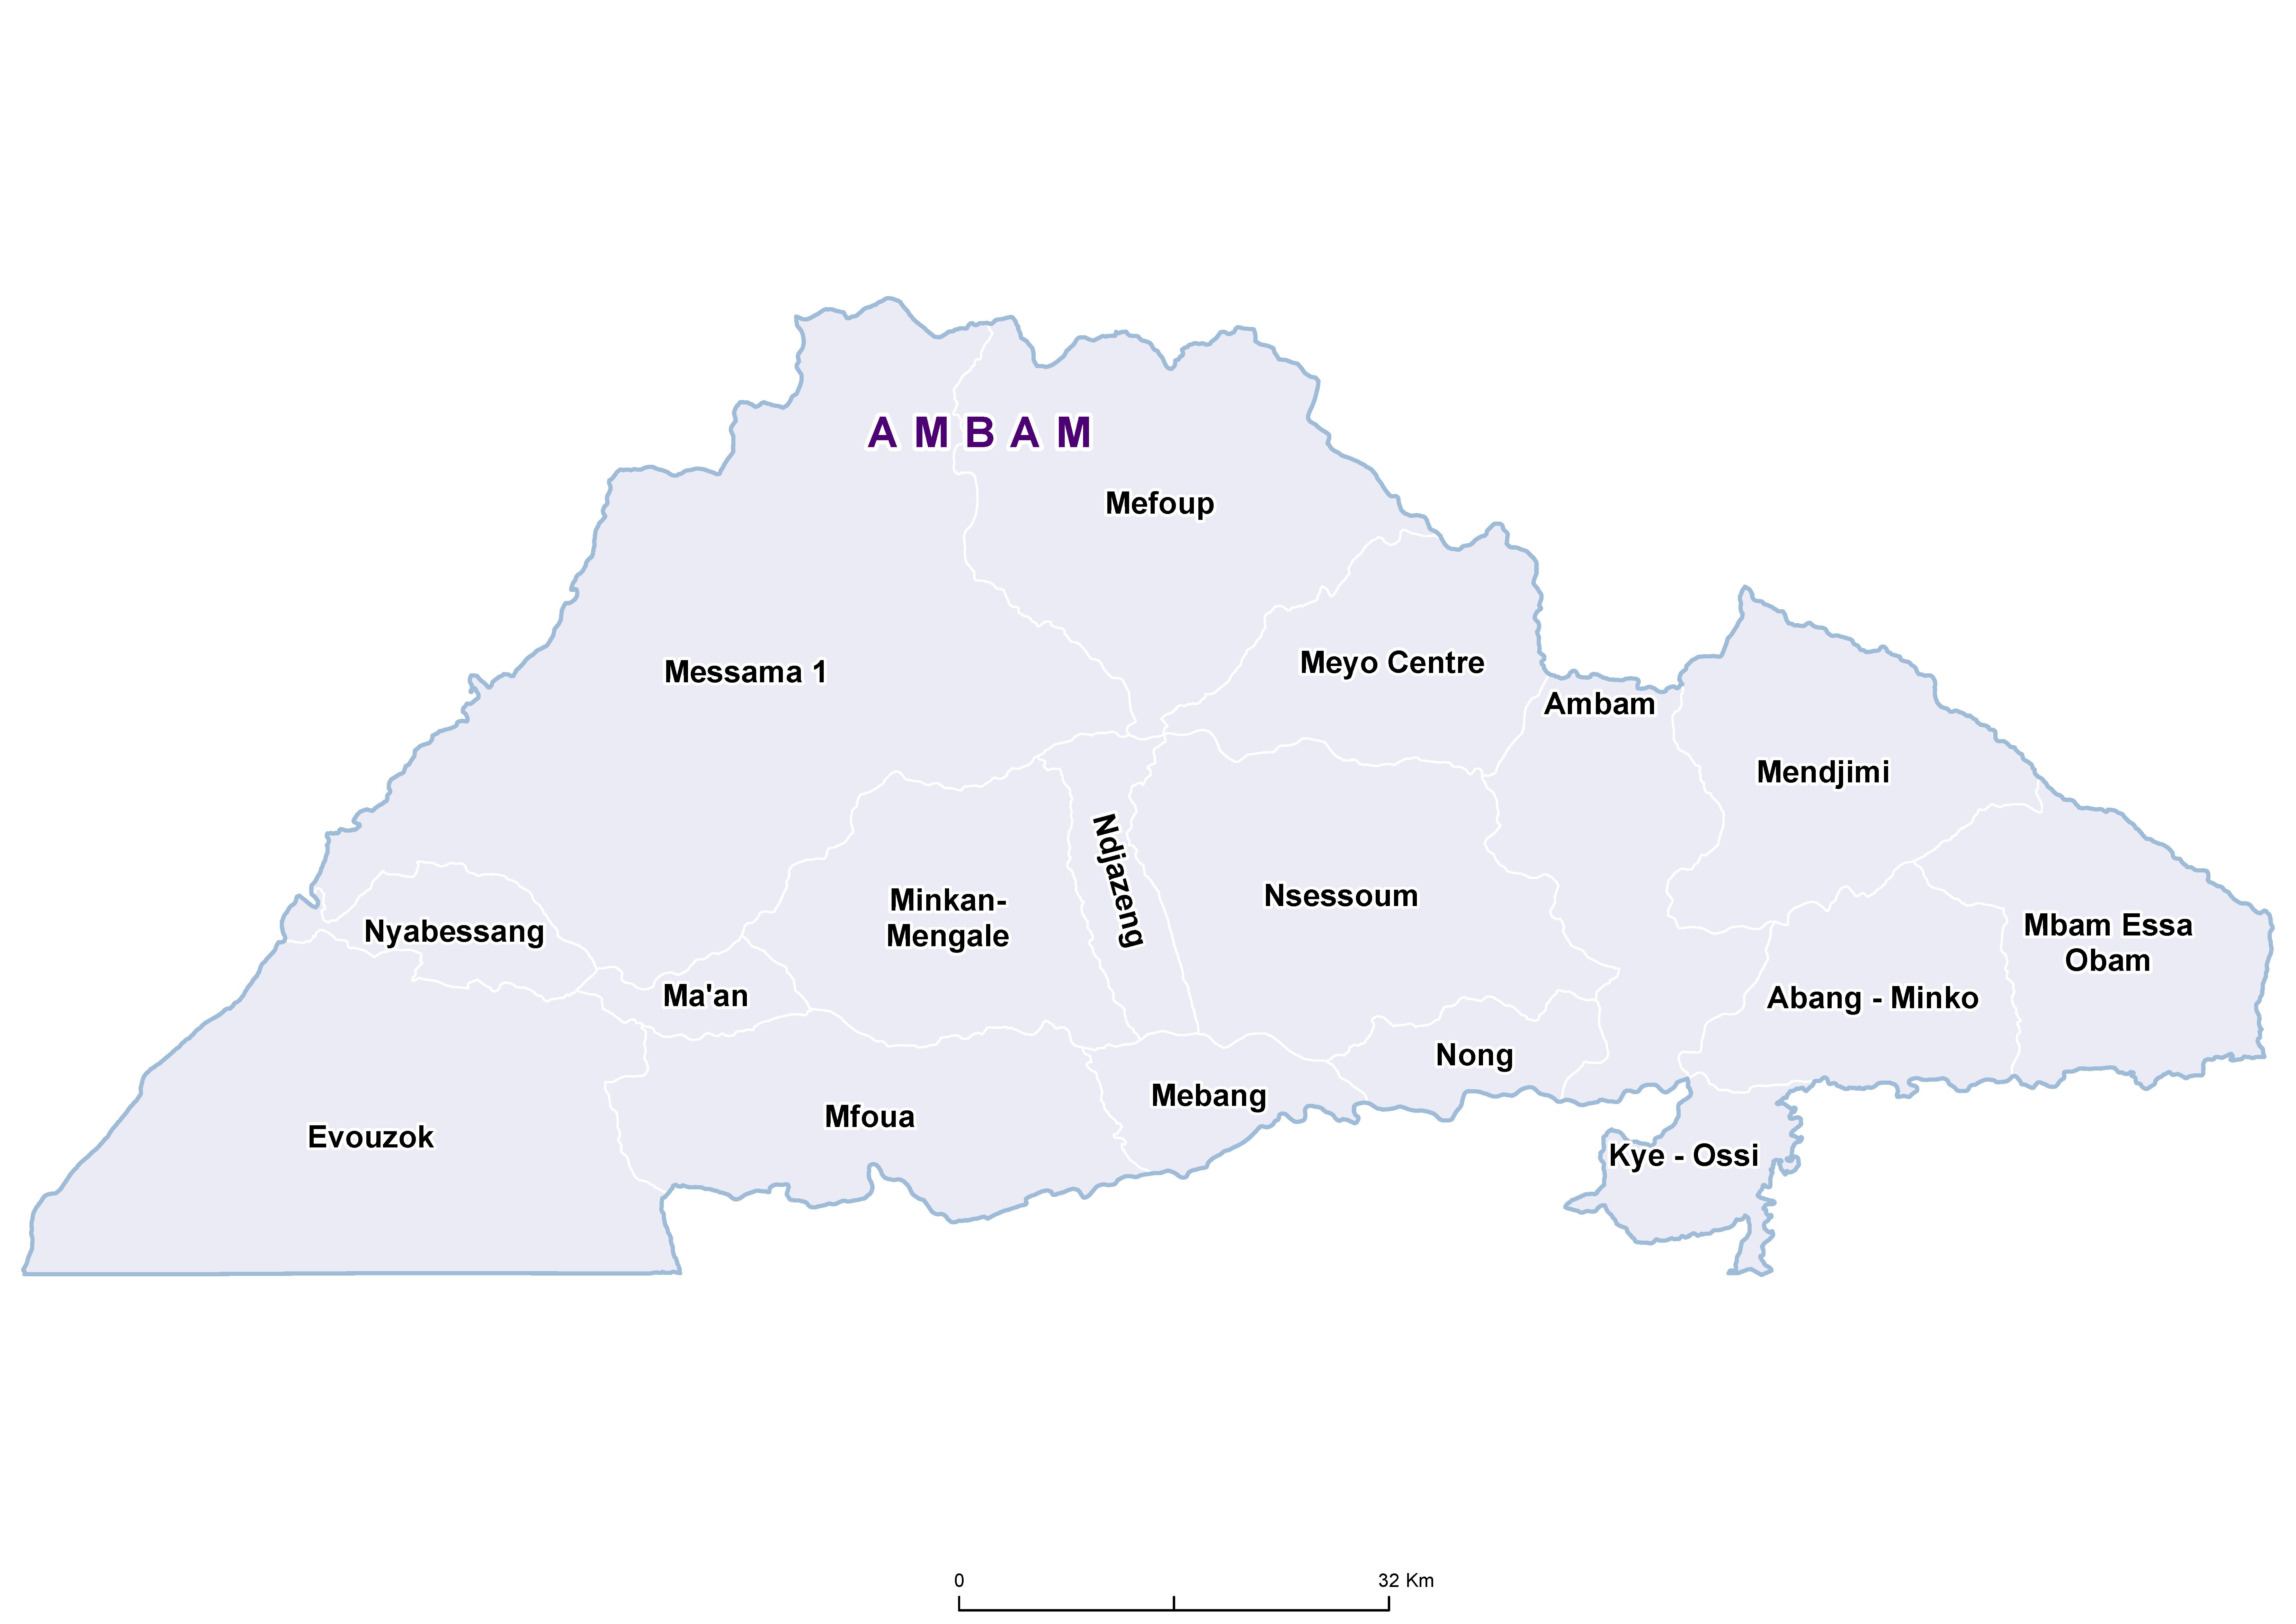 Ambam STH 20180001